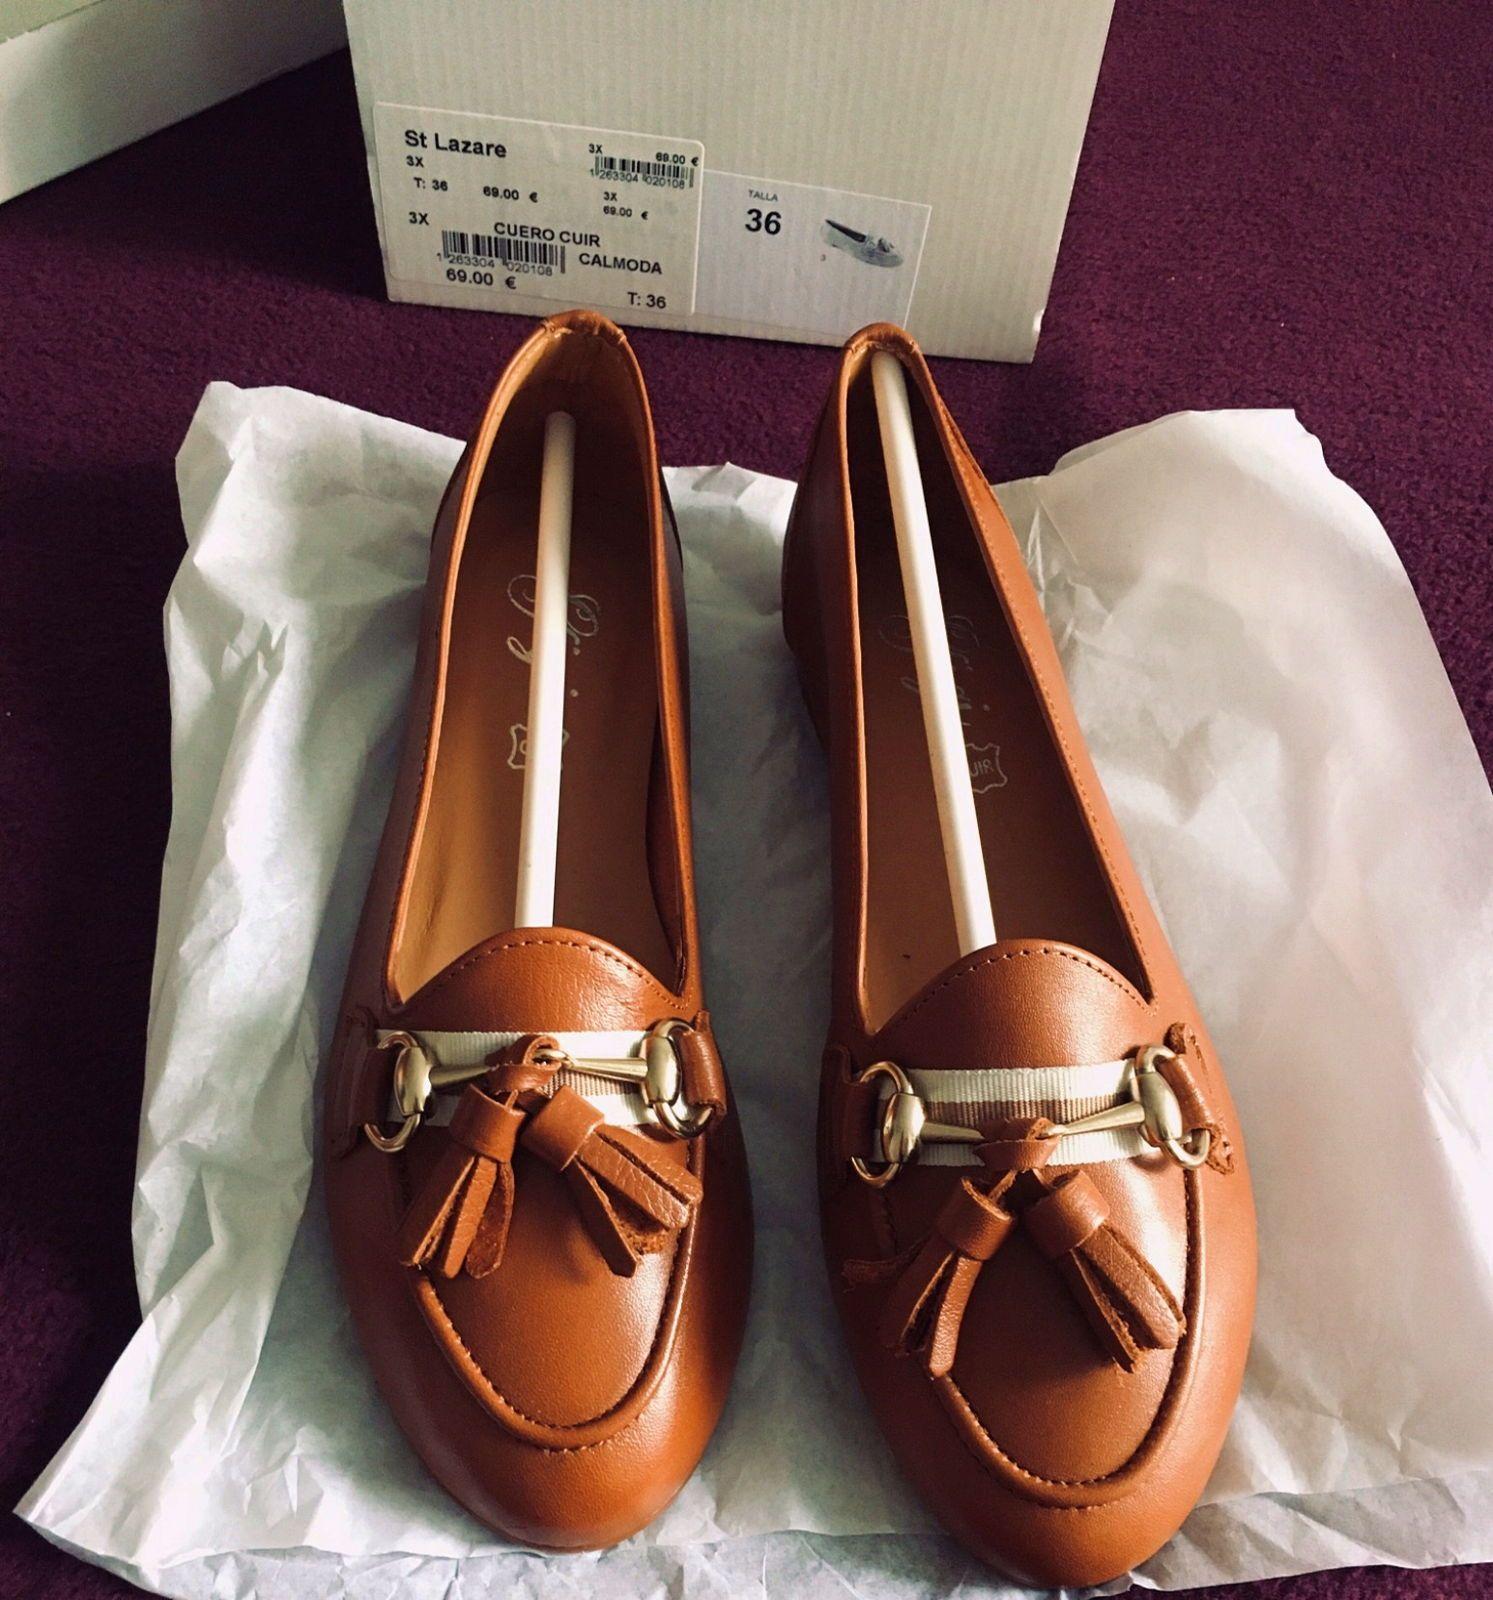 Chaussures camel en cuir plates et neuves marque Calmoda - Pointure 36